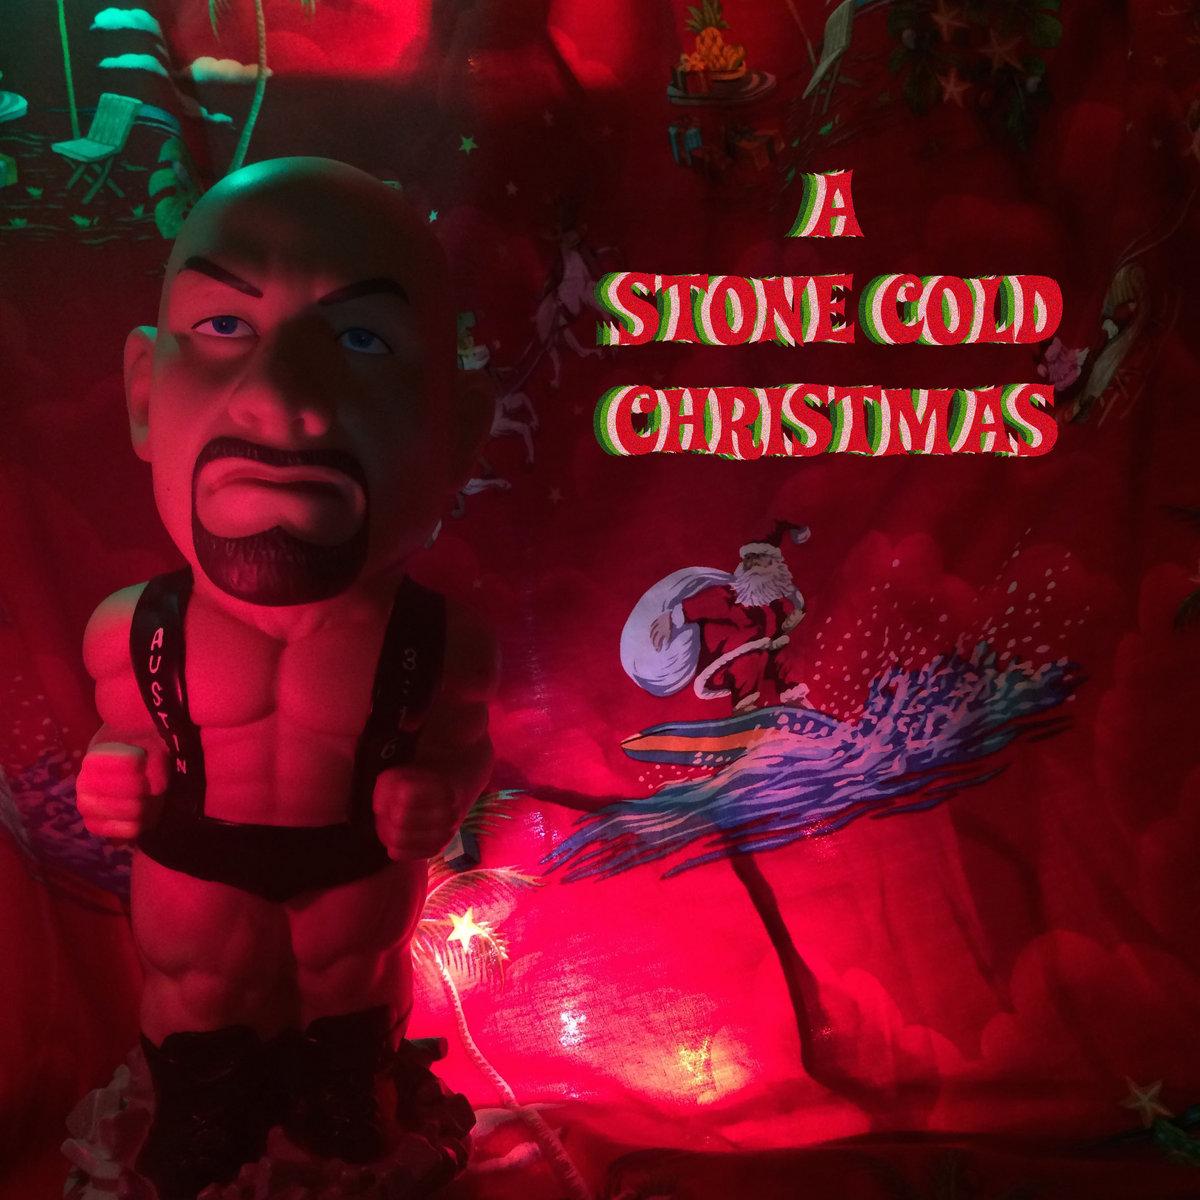 A Stone Cold Christmas.A Stone Cold Christmas Mama